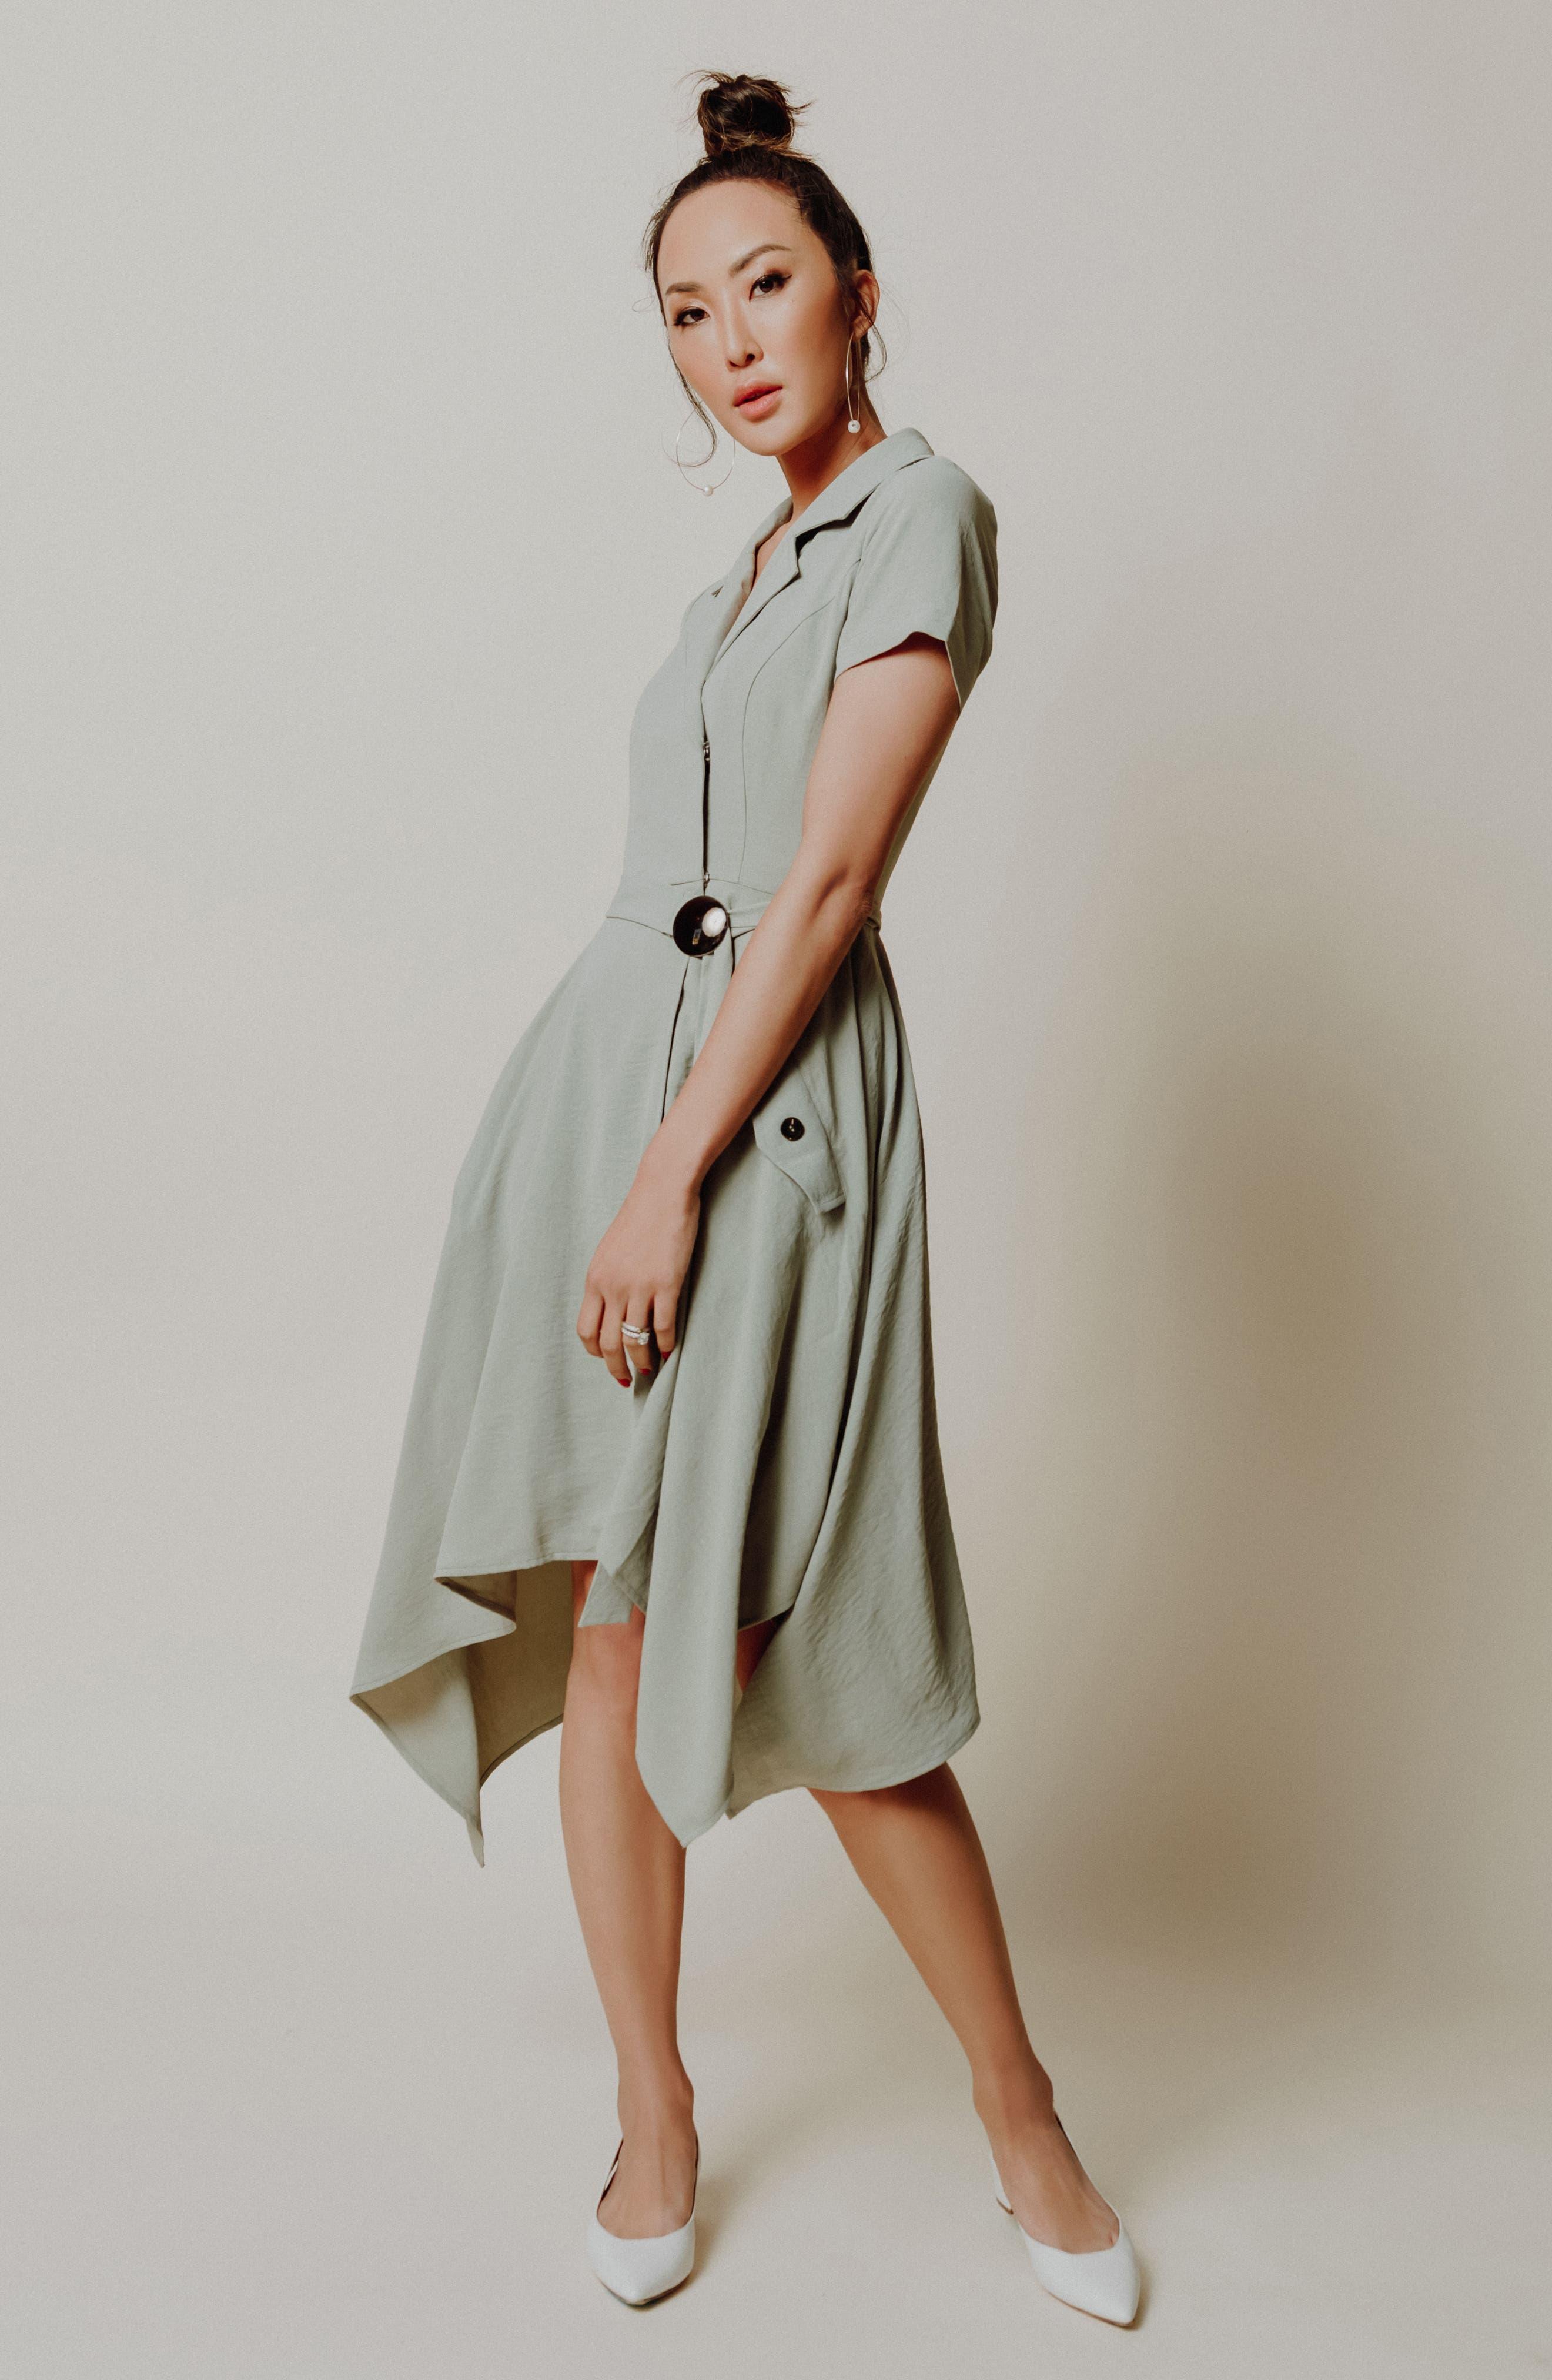 Chriselle x J.O.A. Asymmetrical Trench Dress,                             Alternate thumbnail 9, color,                             300